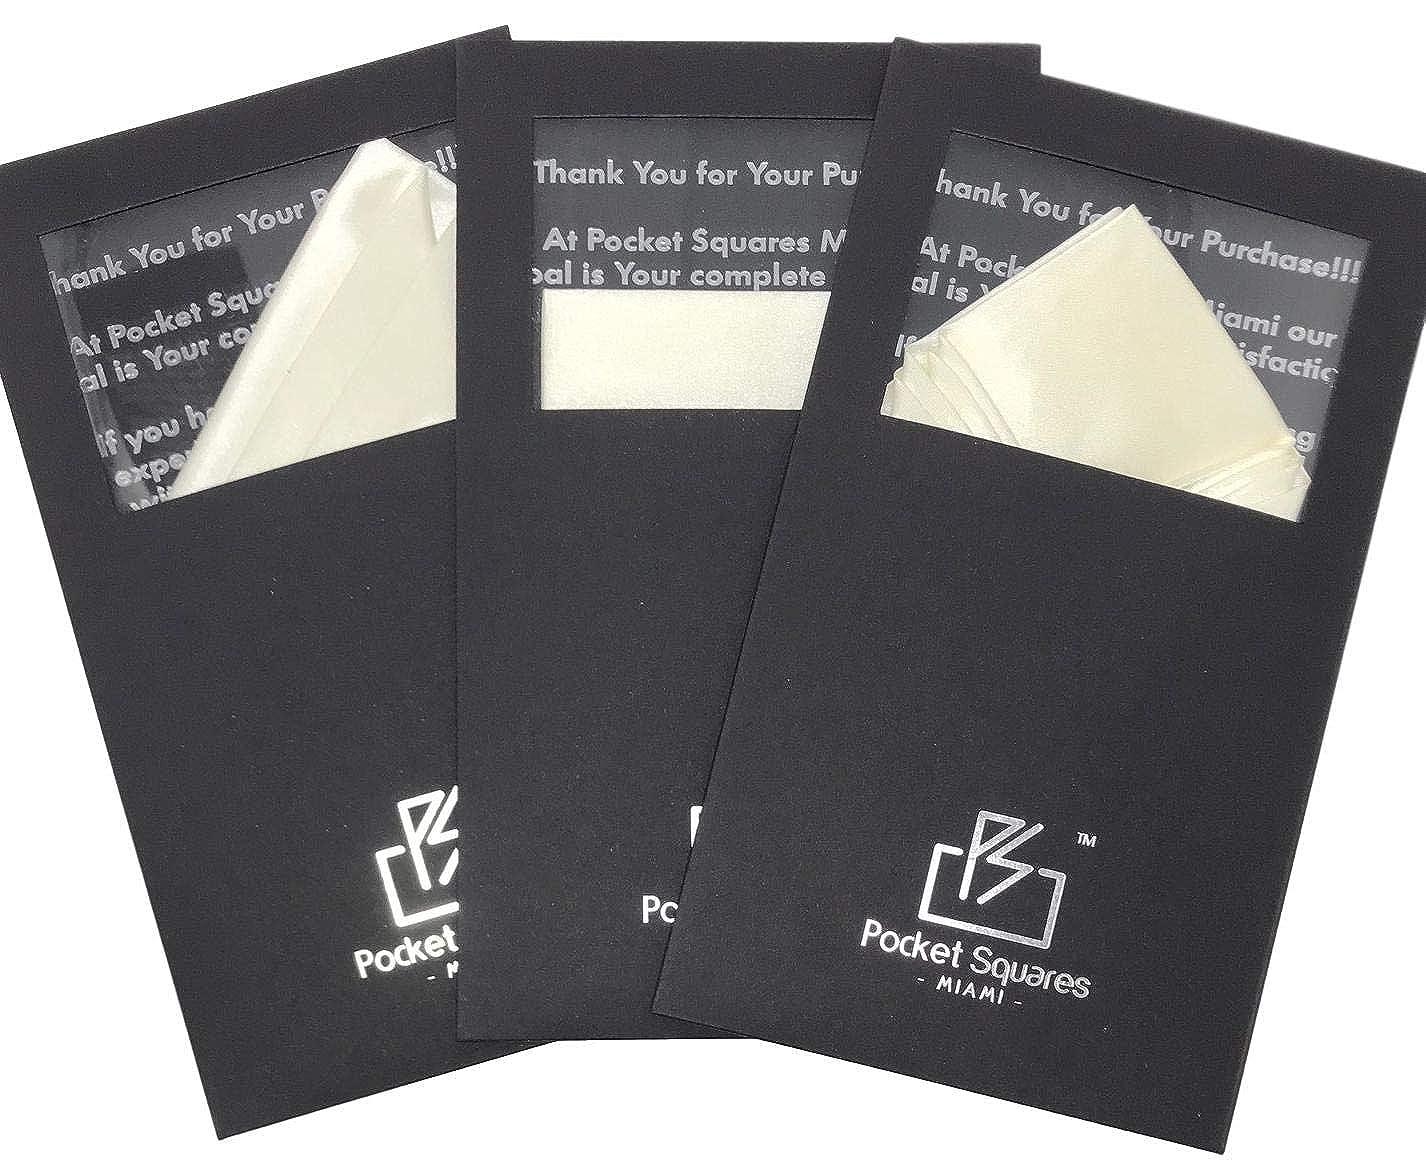 Pocket Squares Miami Pre Folded Pocket Square I 3 Piece Value Bundle-Cream Collection